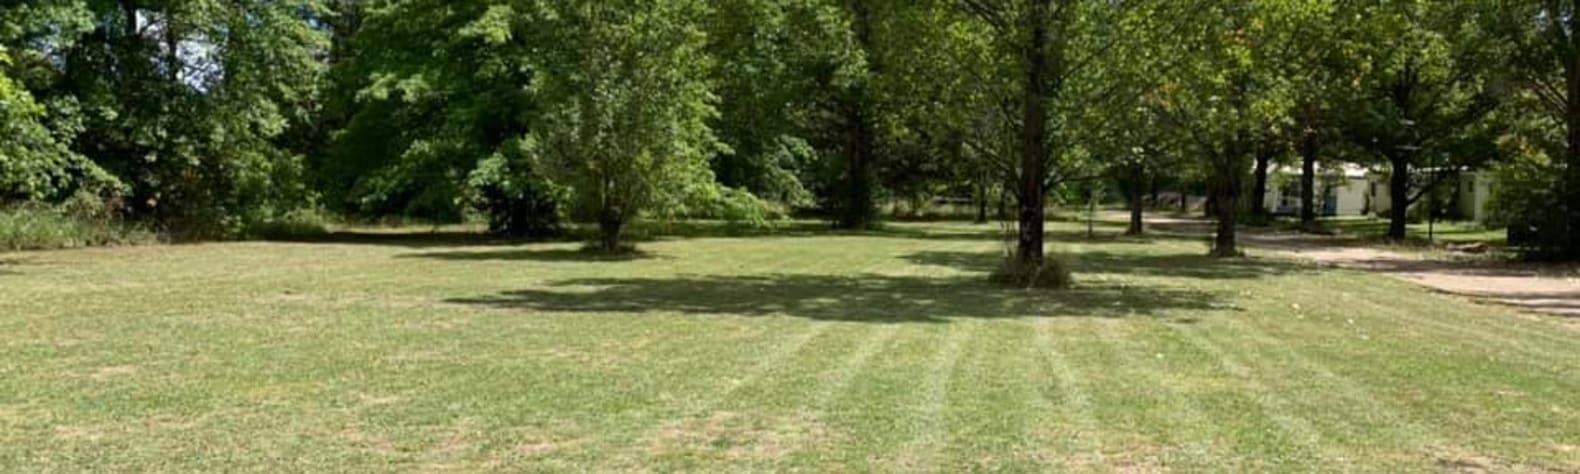 New England Highlands RV Park